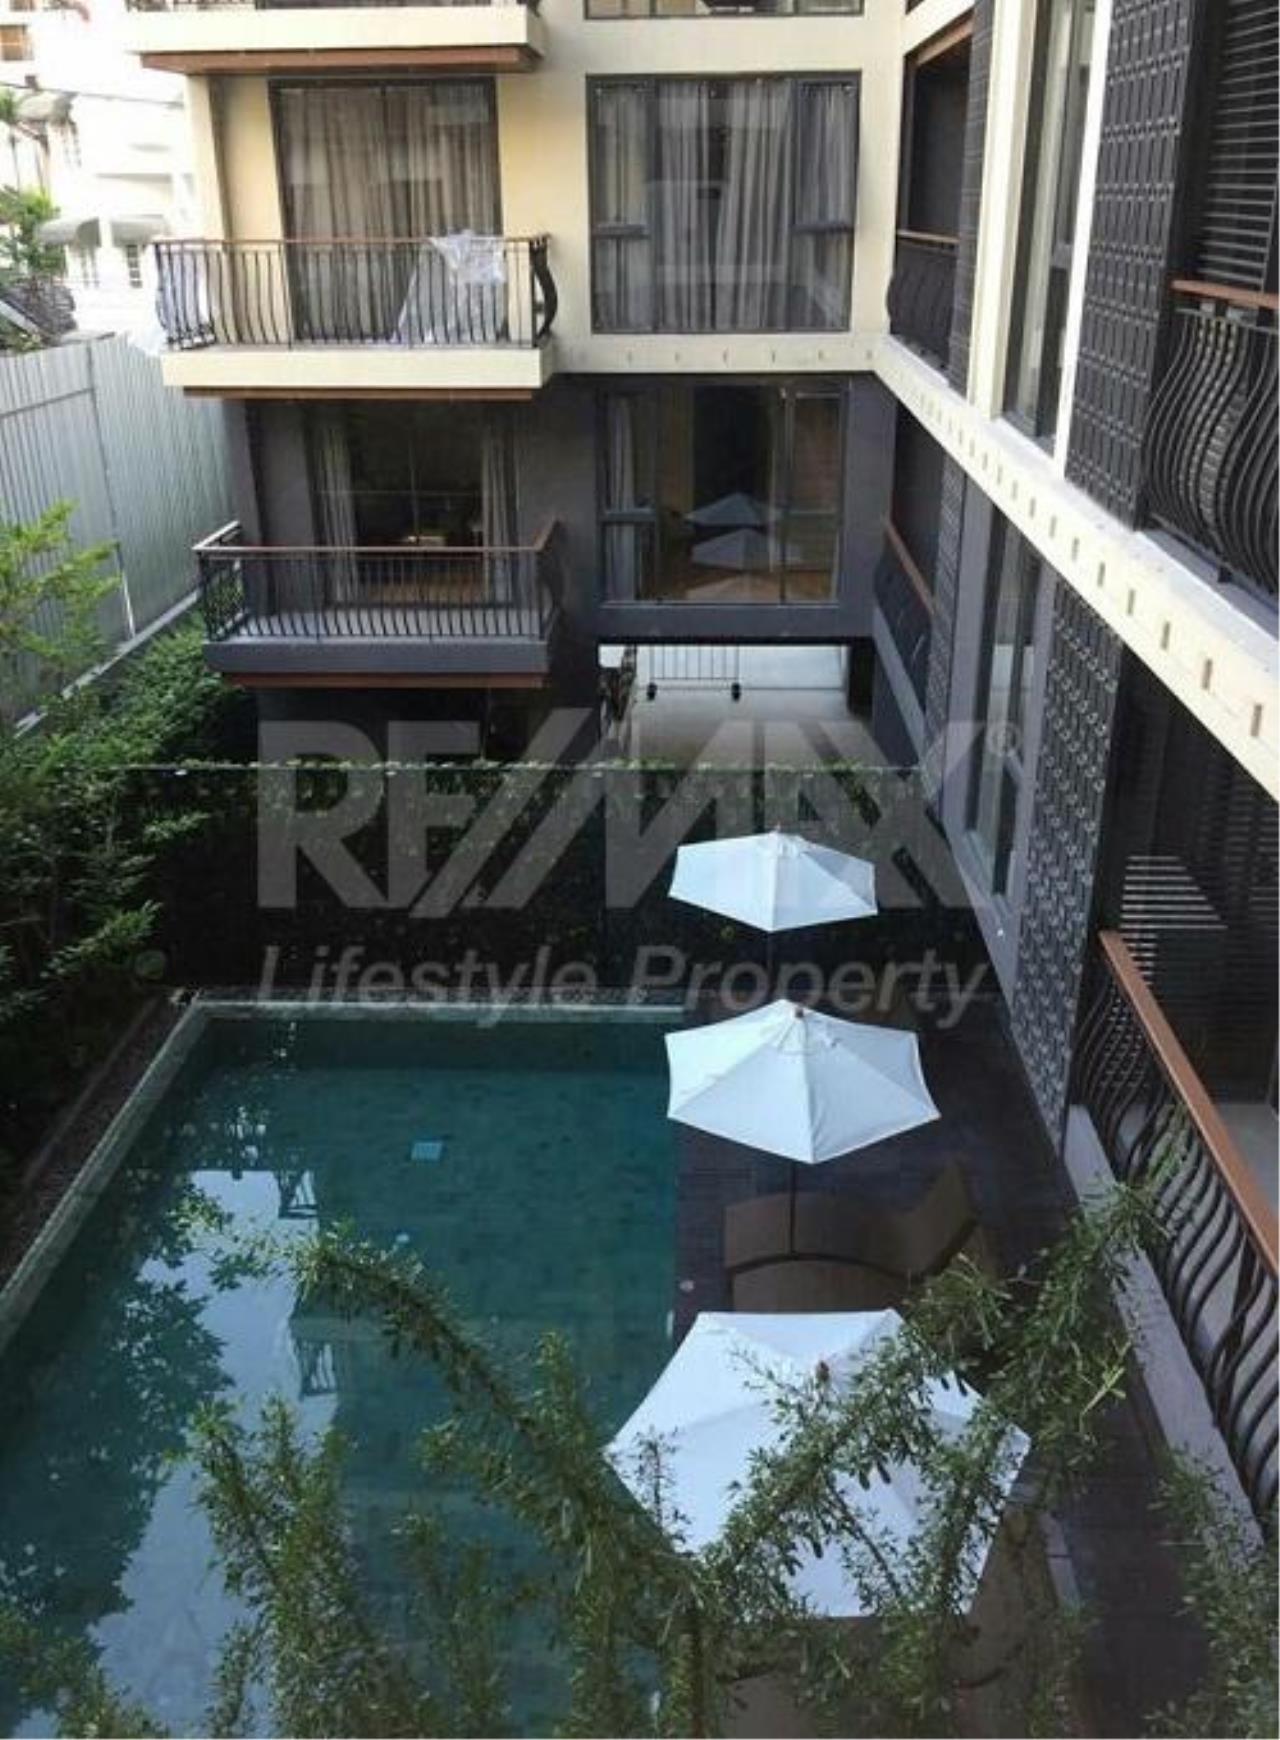 RE/MAX LifeStyle Property Agency's Klass Condo Langsuan 11